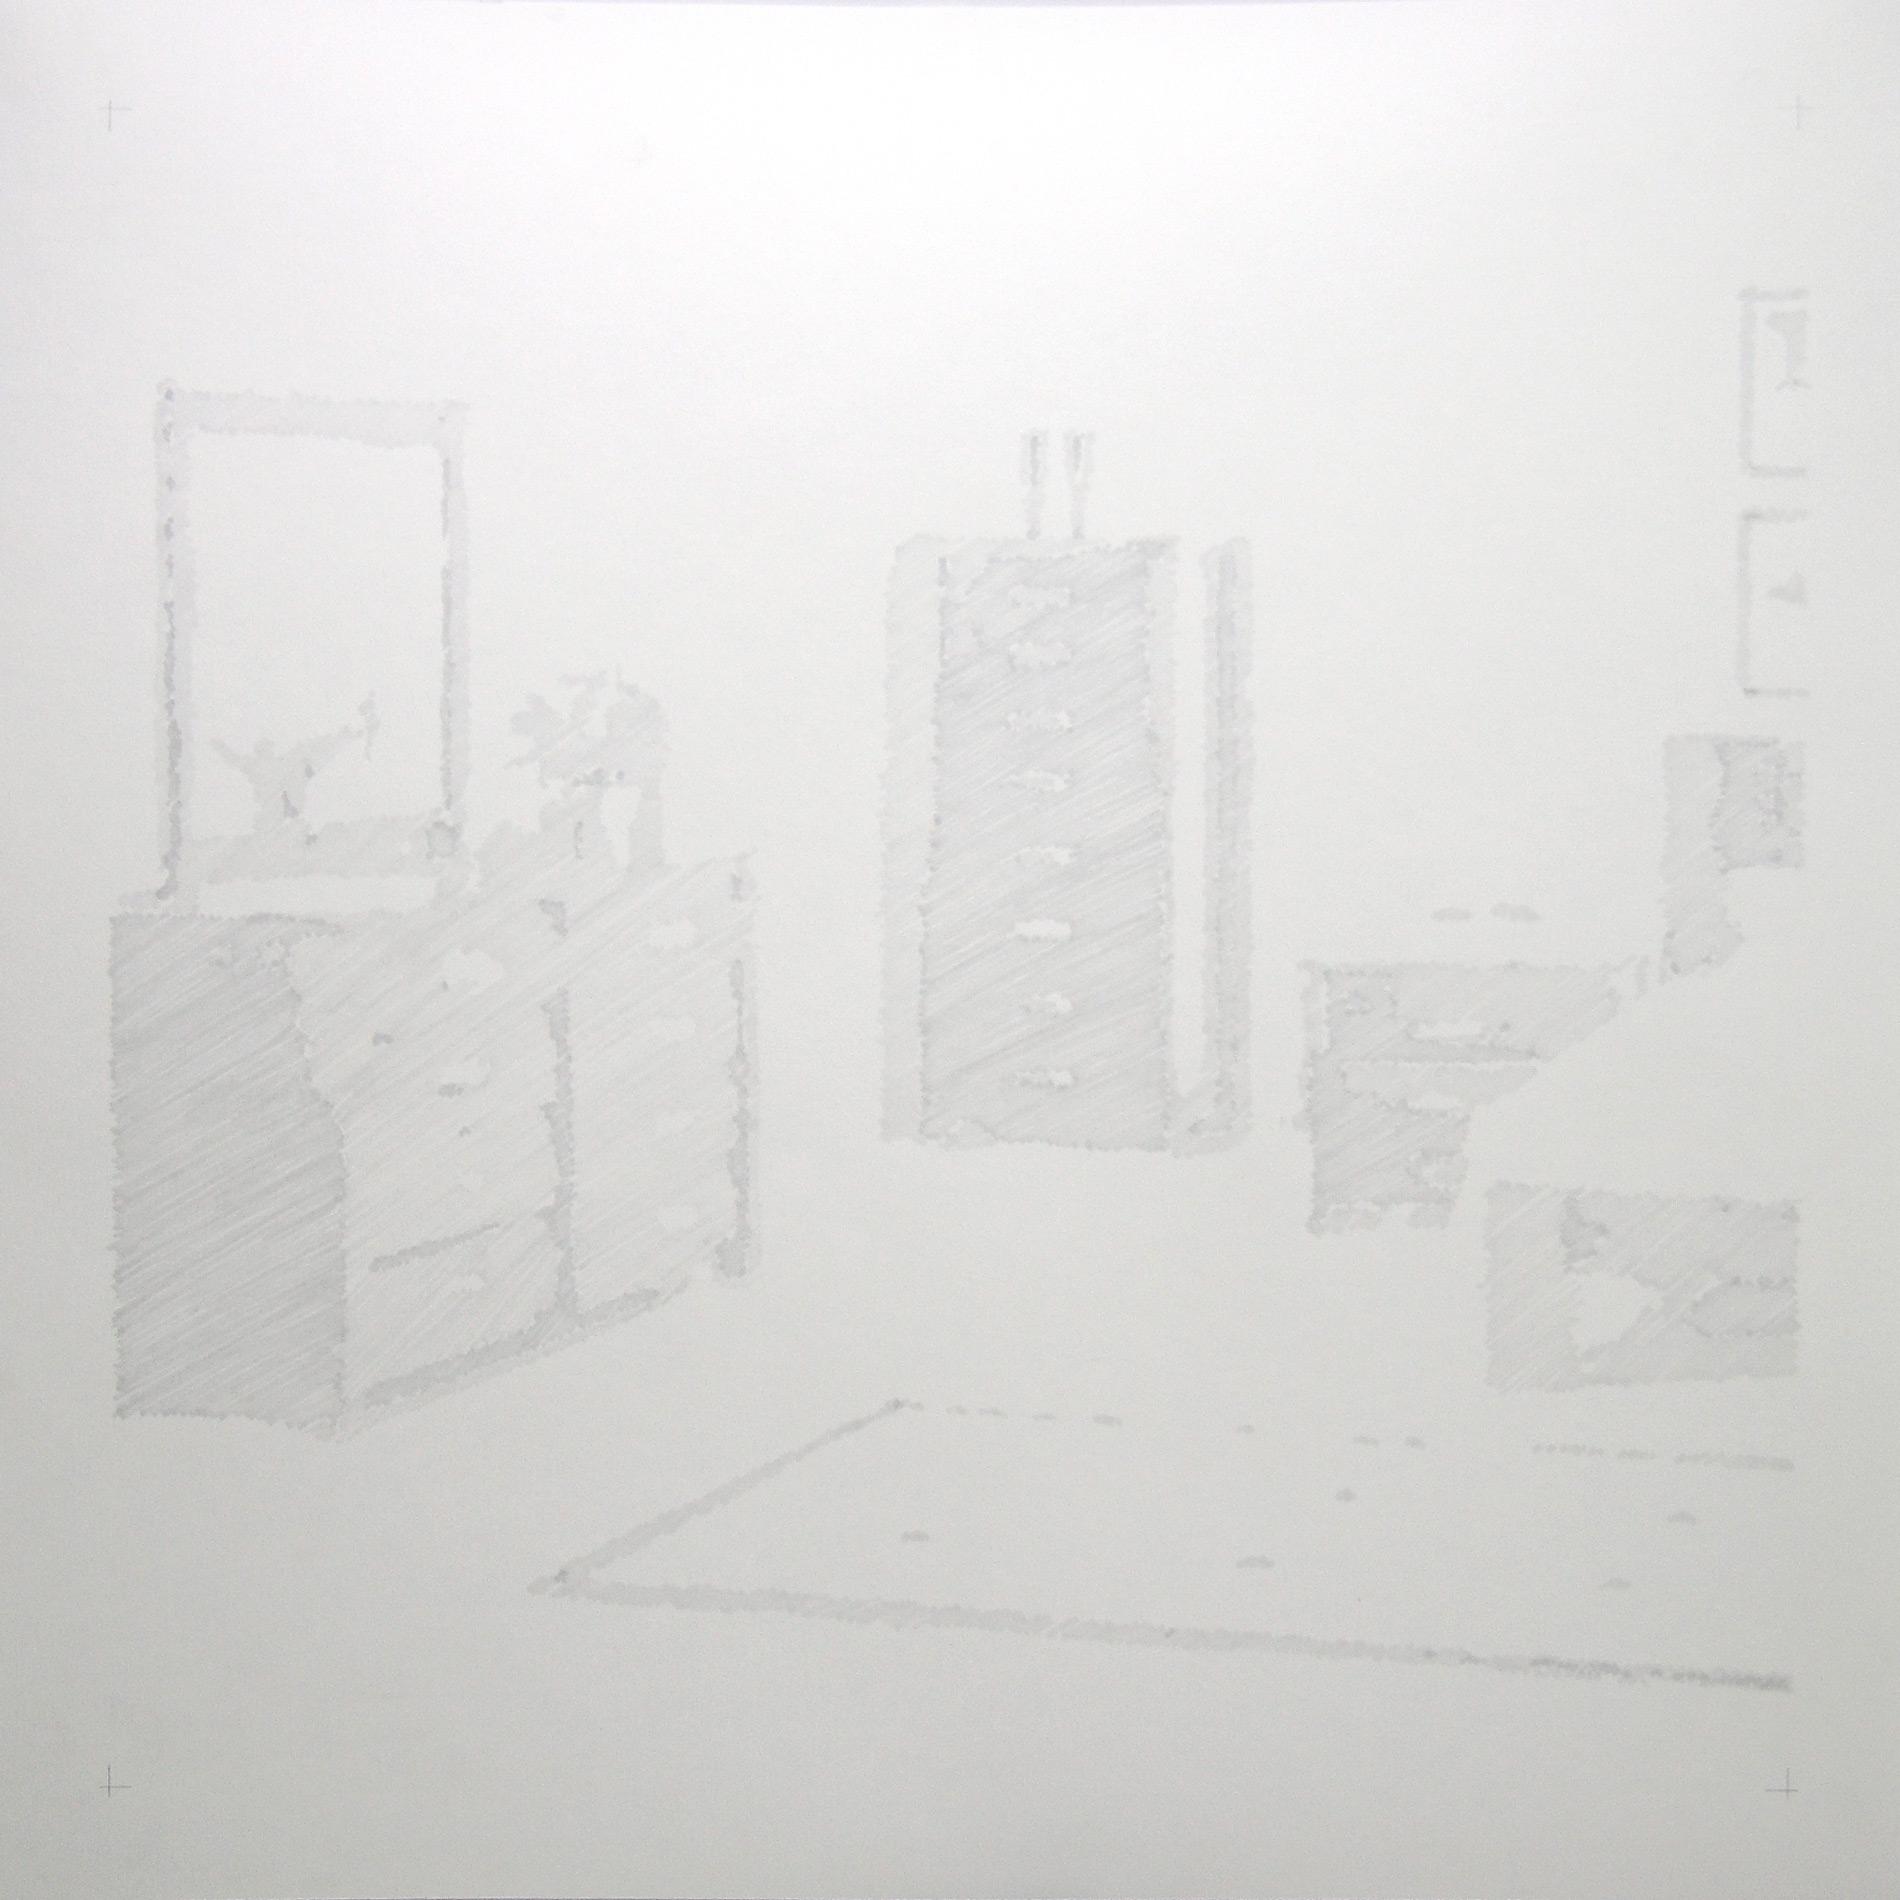 Michael Göbel - o. T. (Bedrooms 8), 2007